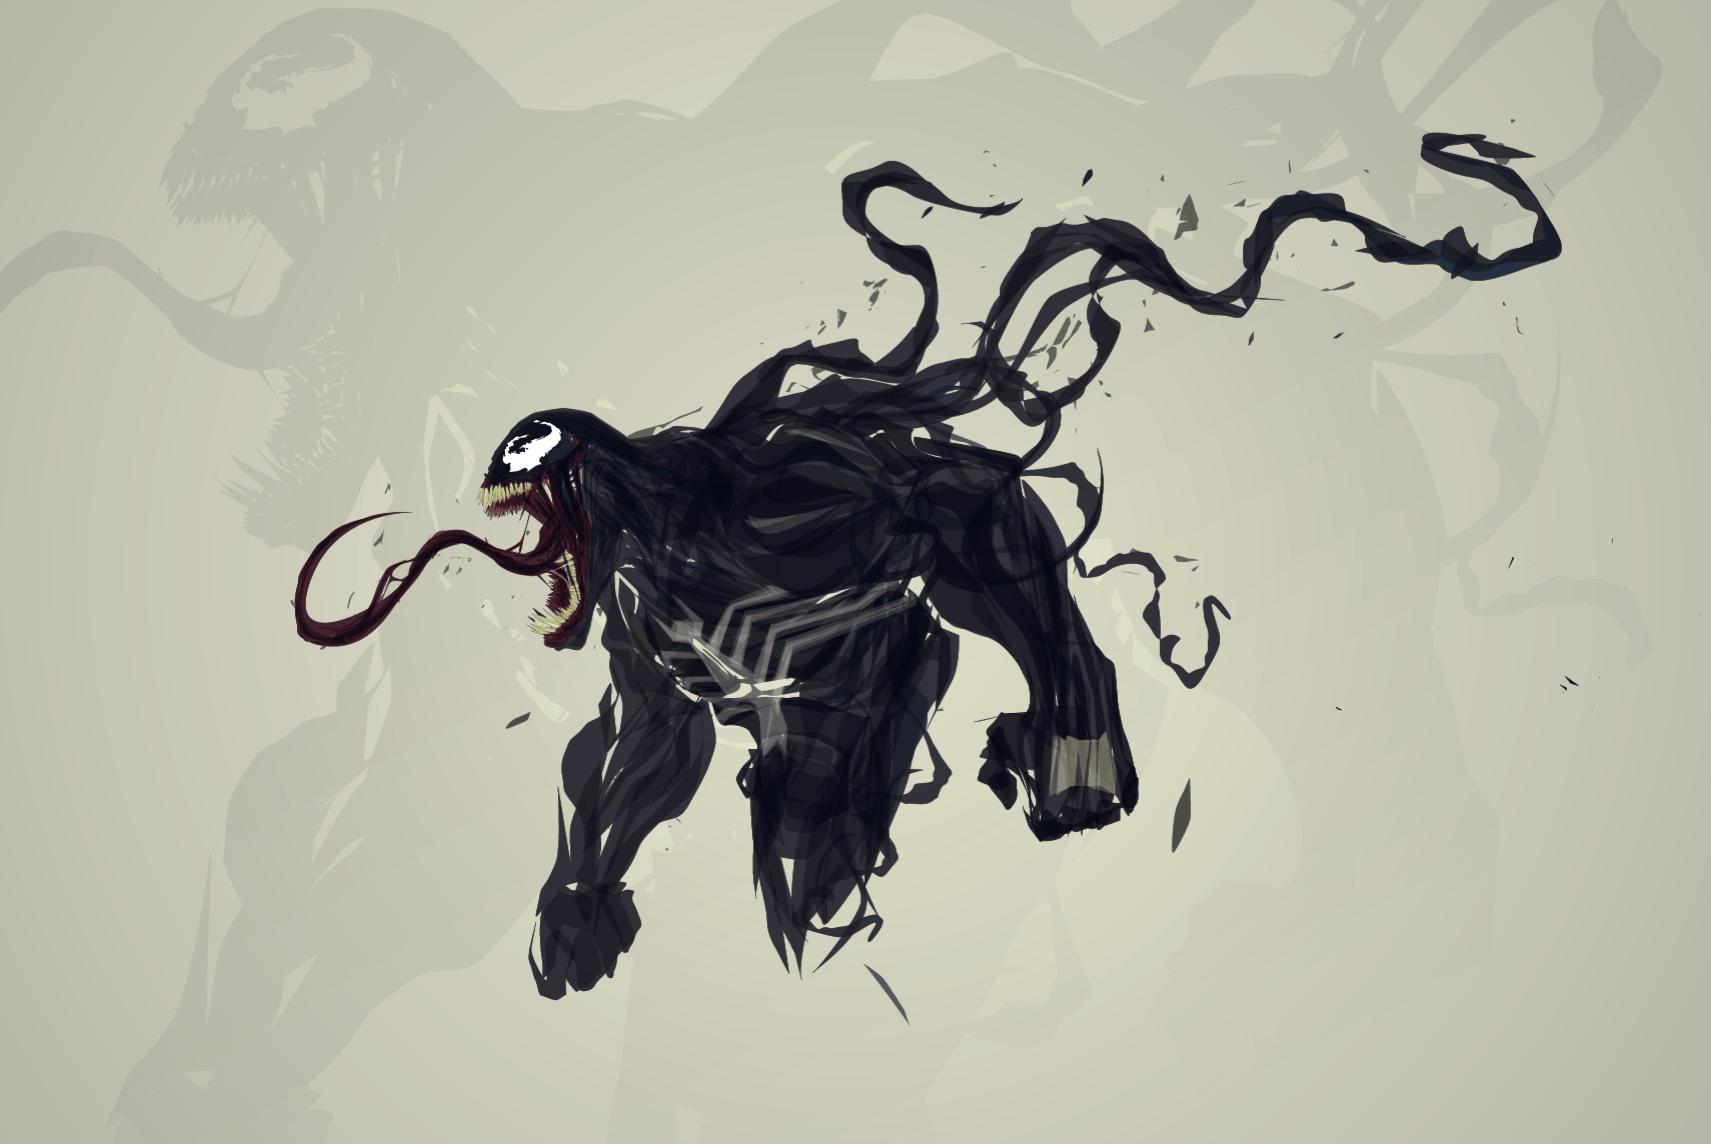 1711x1144px Anti Venom Wallpapers